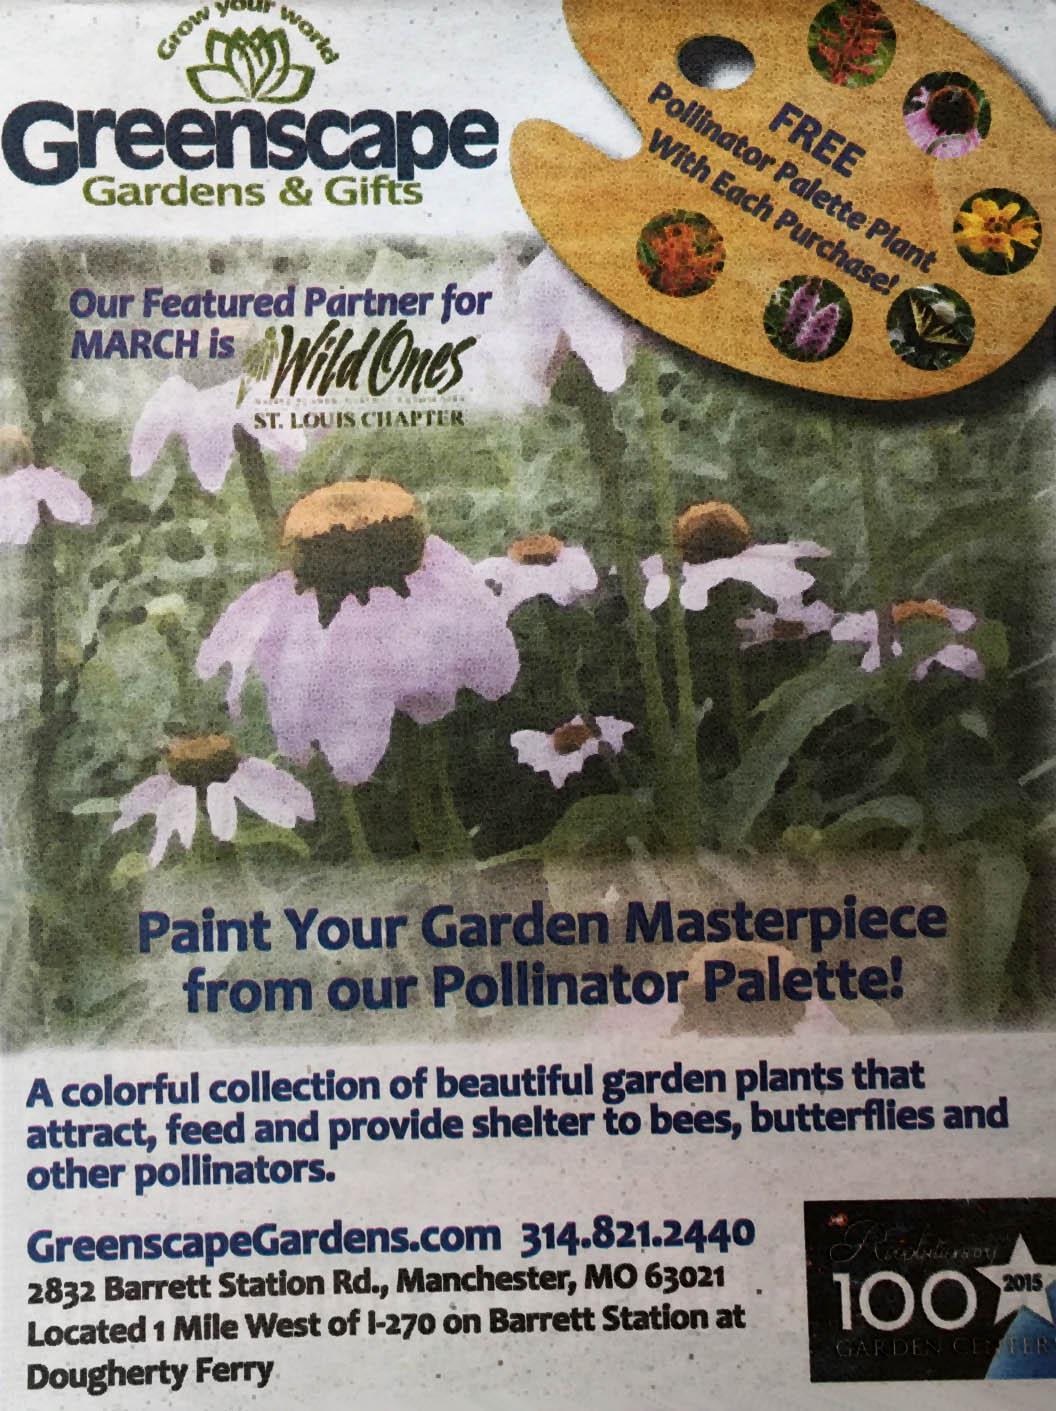 Pollinator Palette Promotion